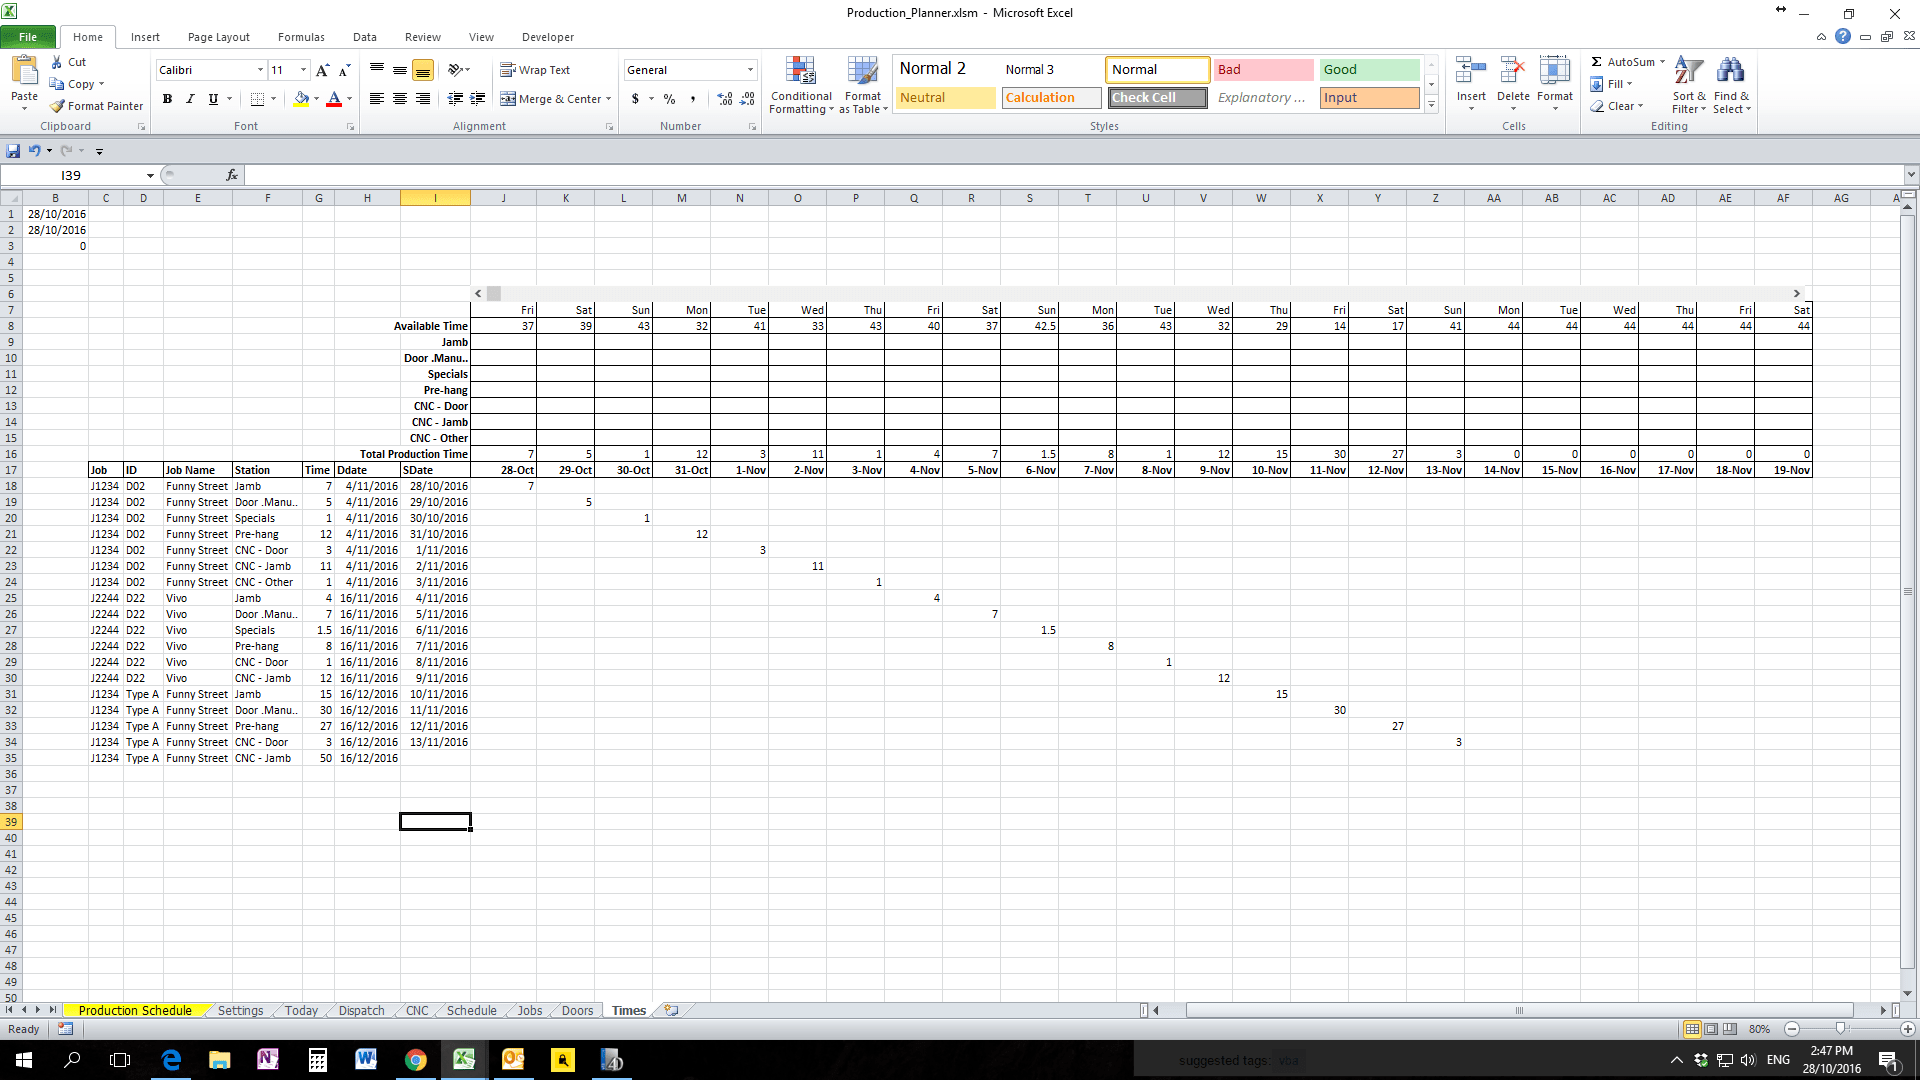 Worksheet From Workbook C